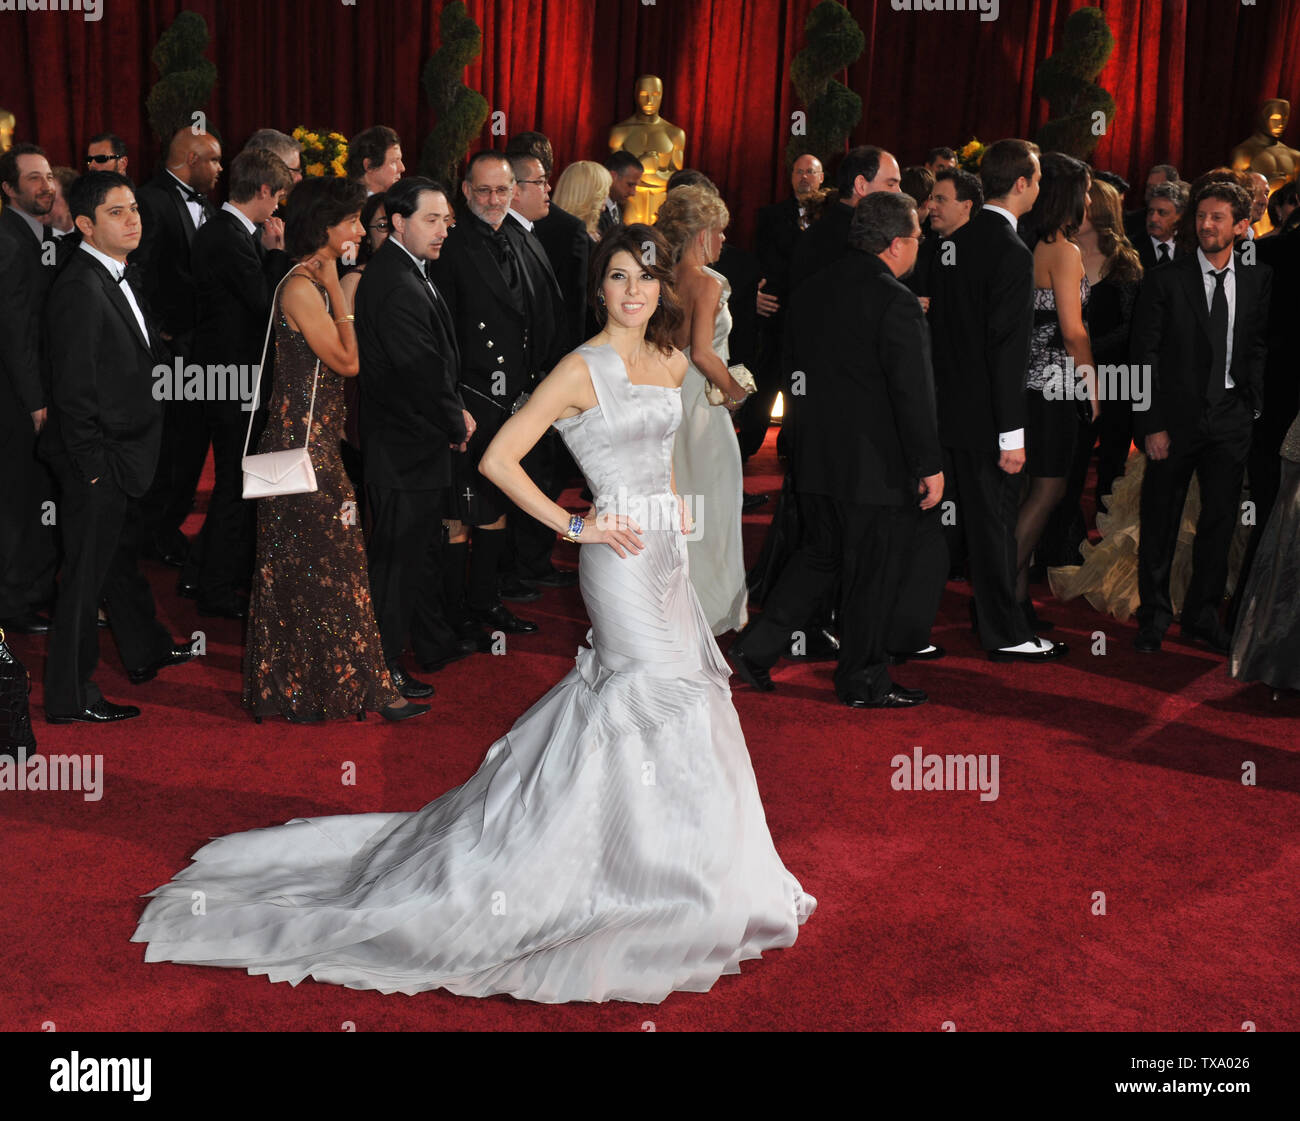 Marissa Stock Photos & Marissa Stock Images - Page 3 - Alamy